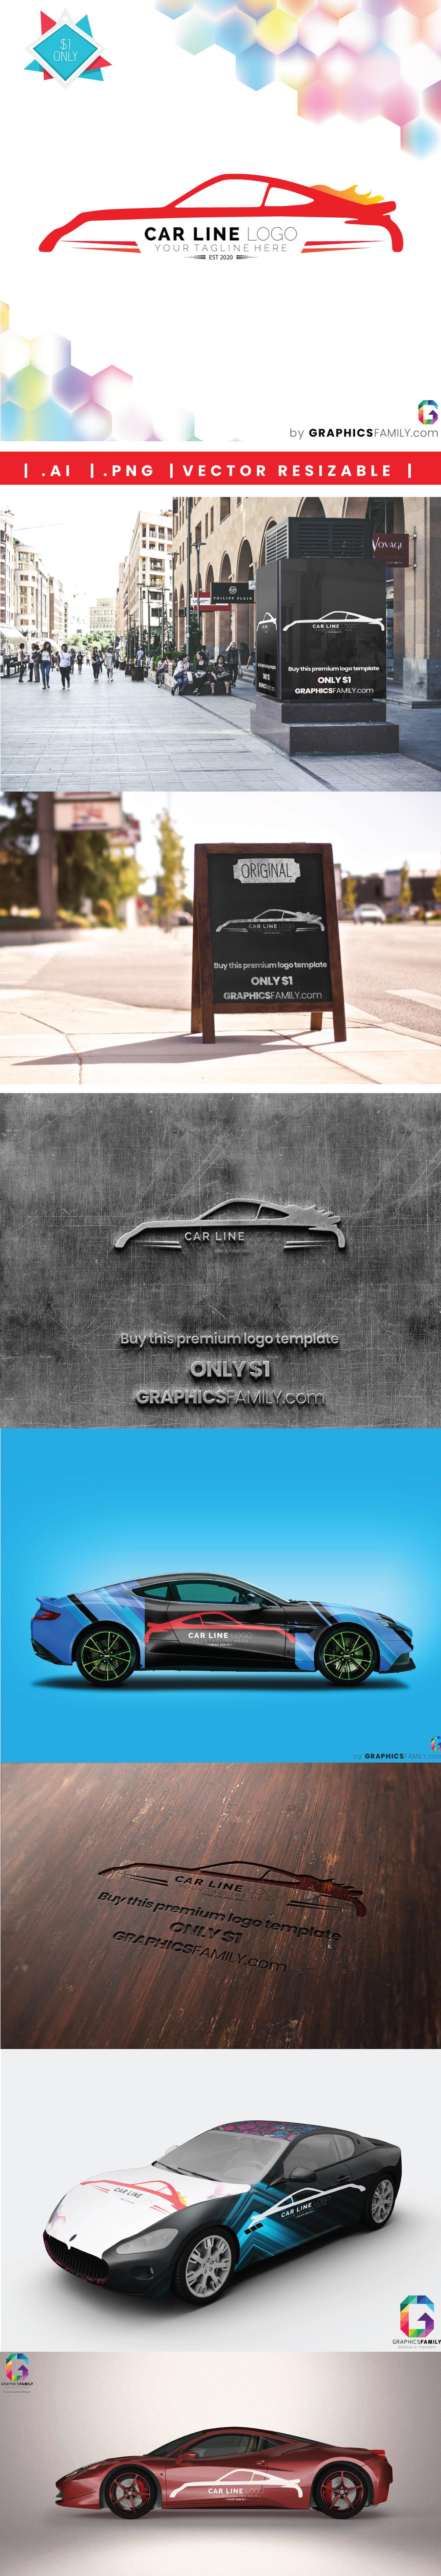 mockup-collection-car-line-logo